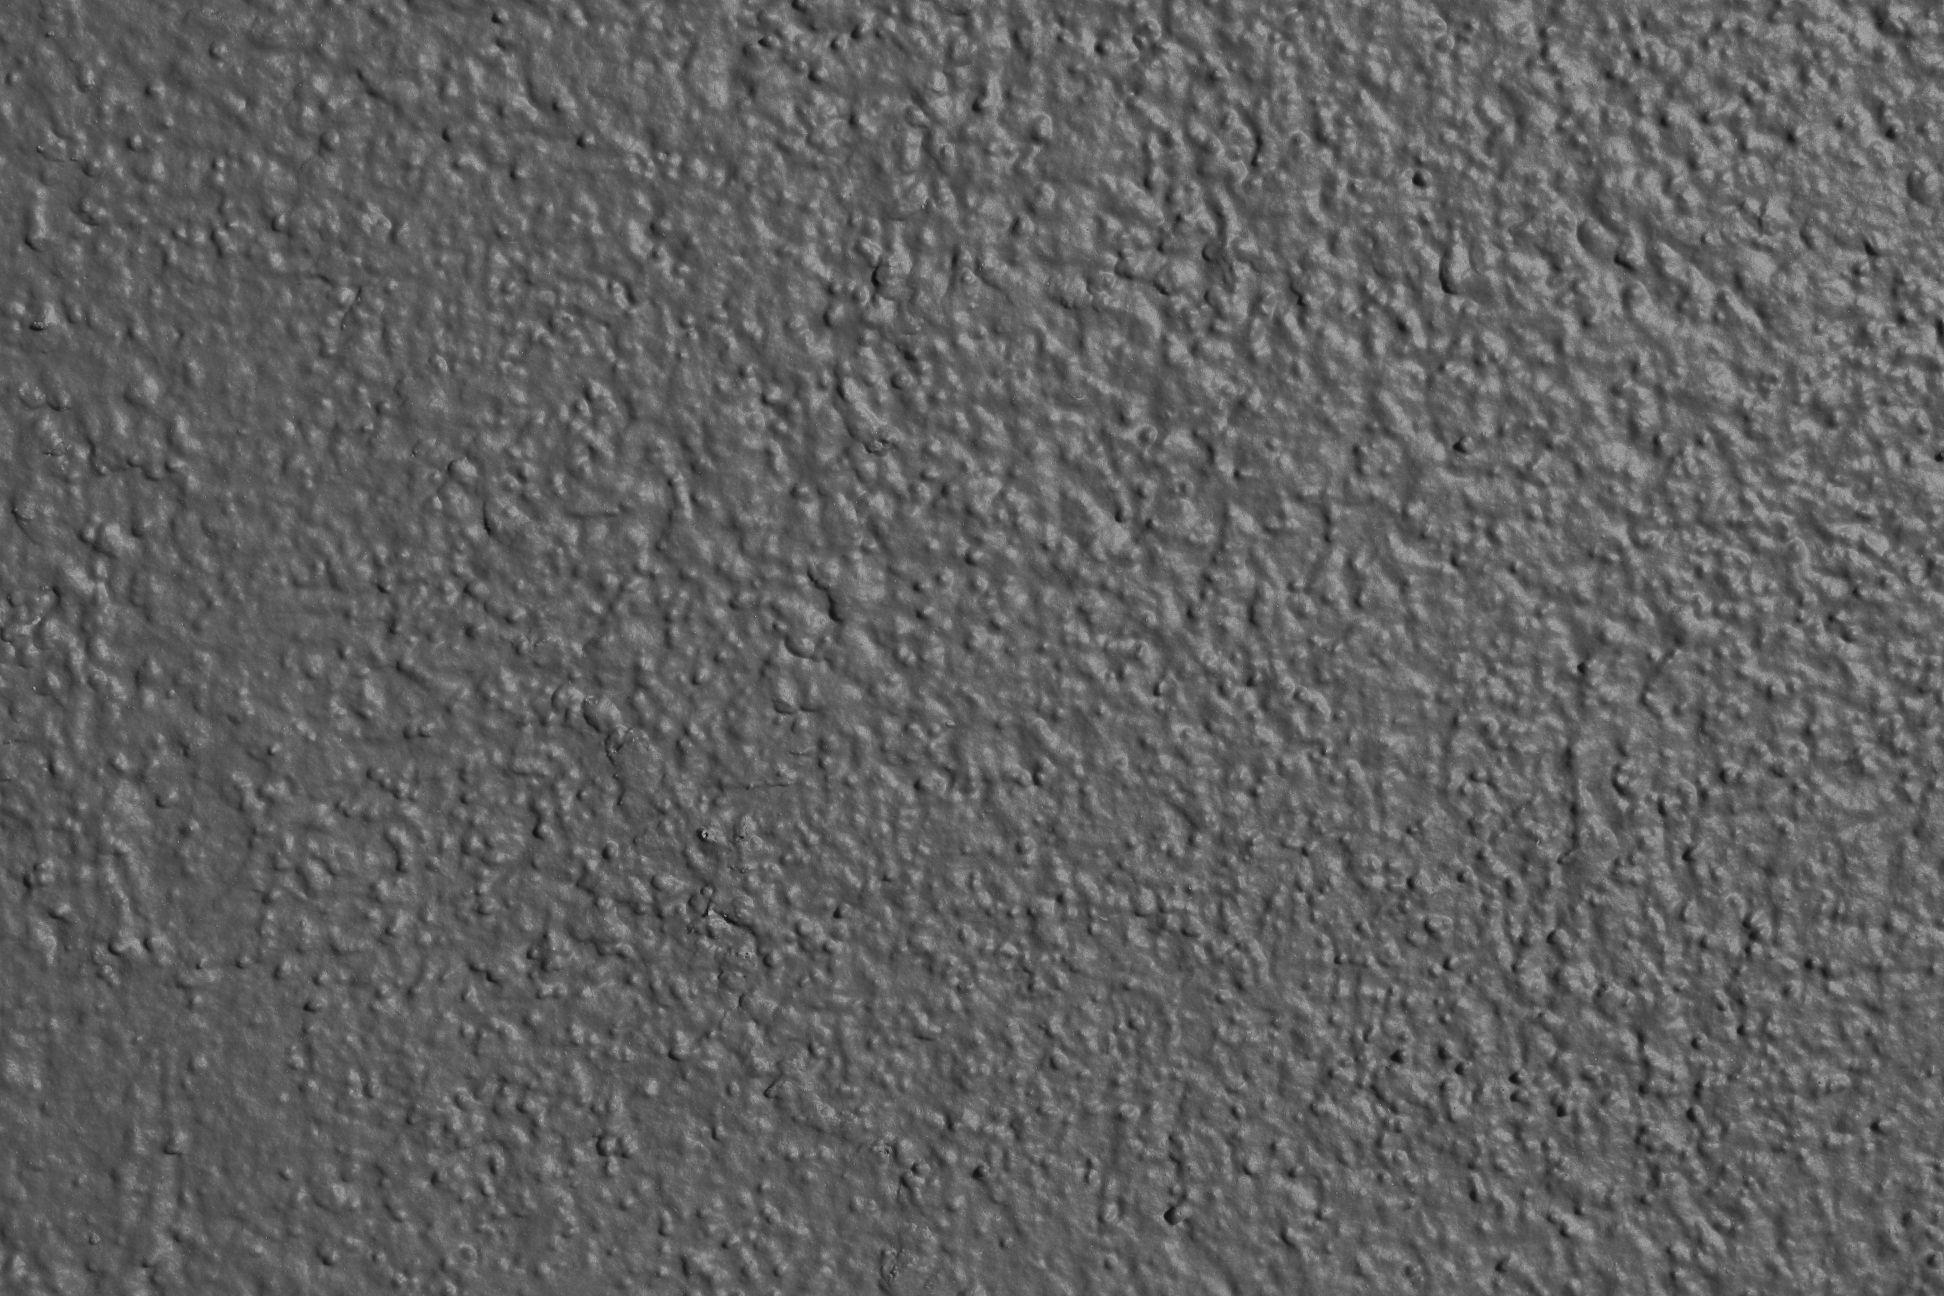 Black wall texture photo